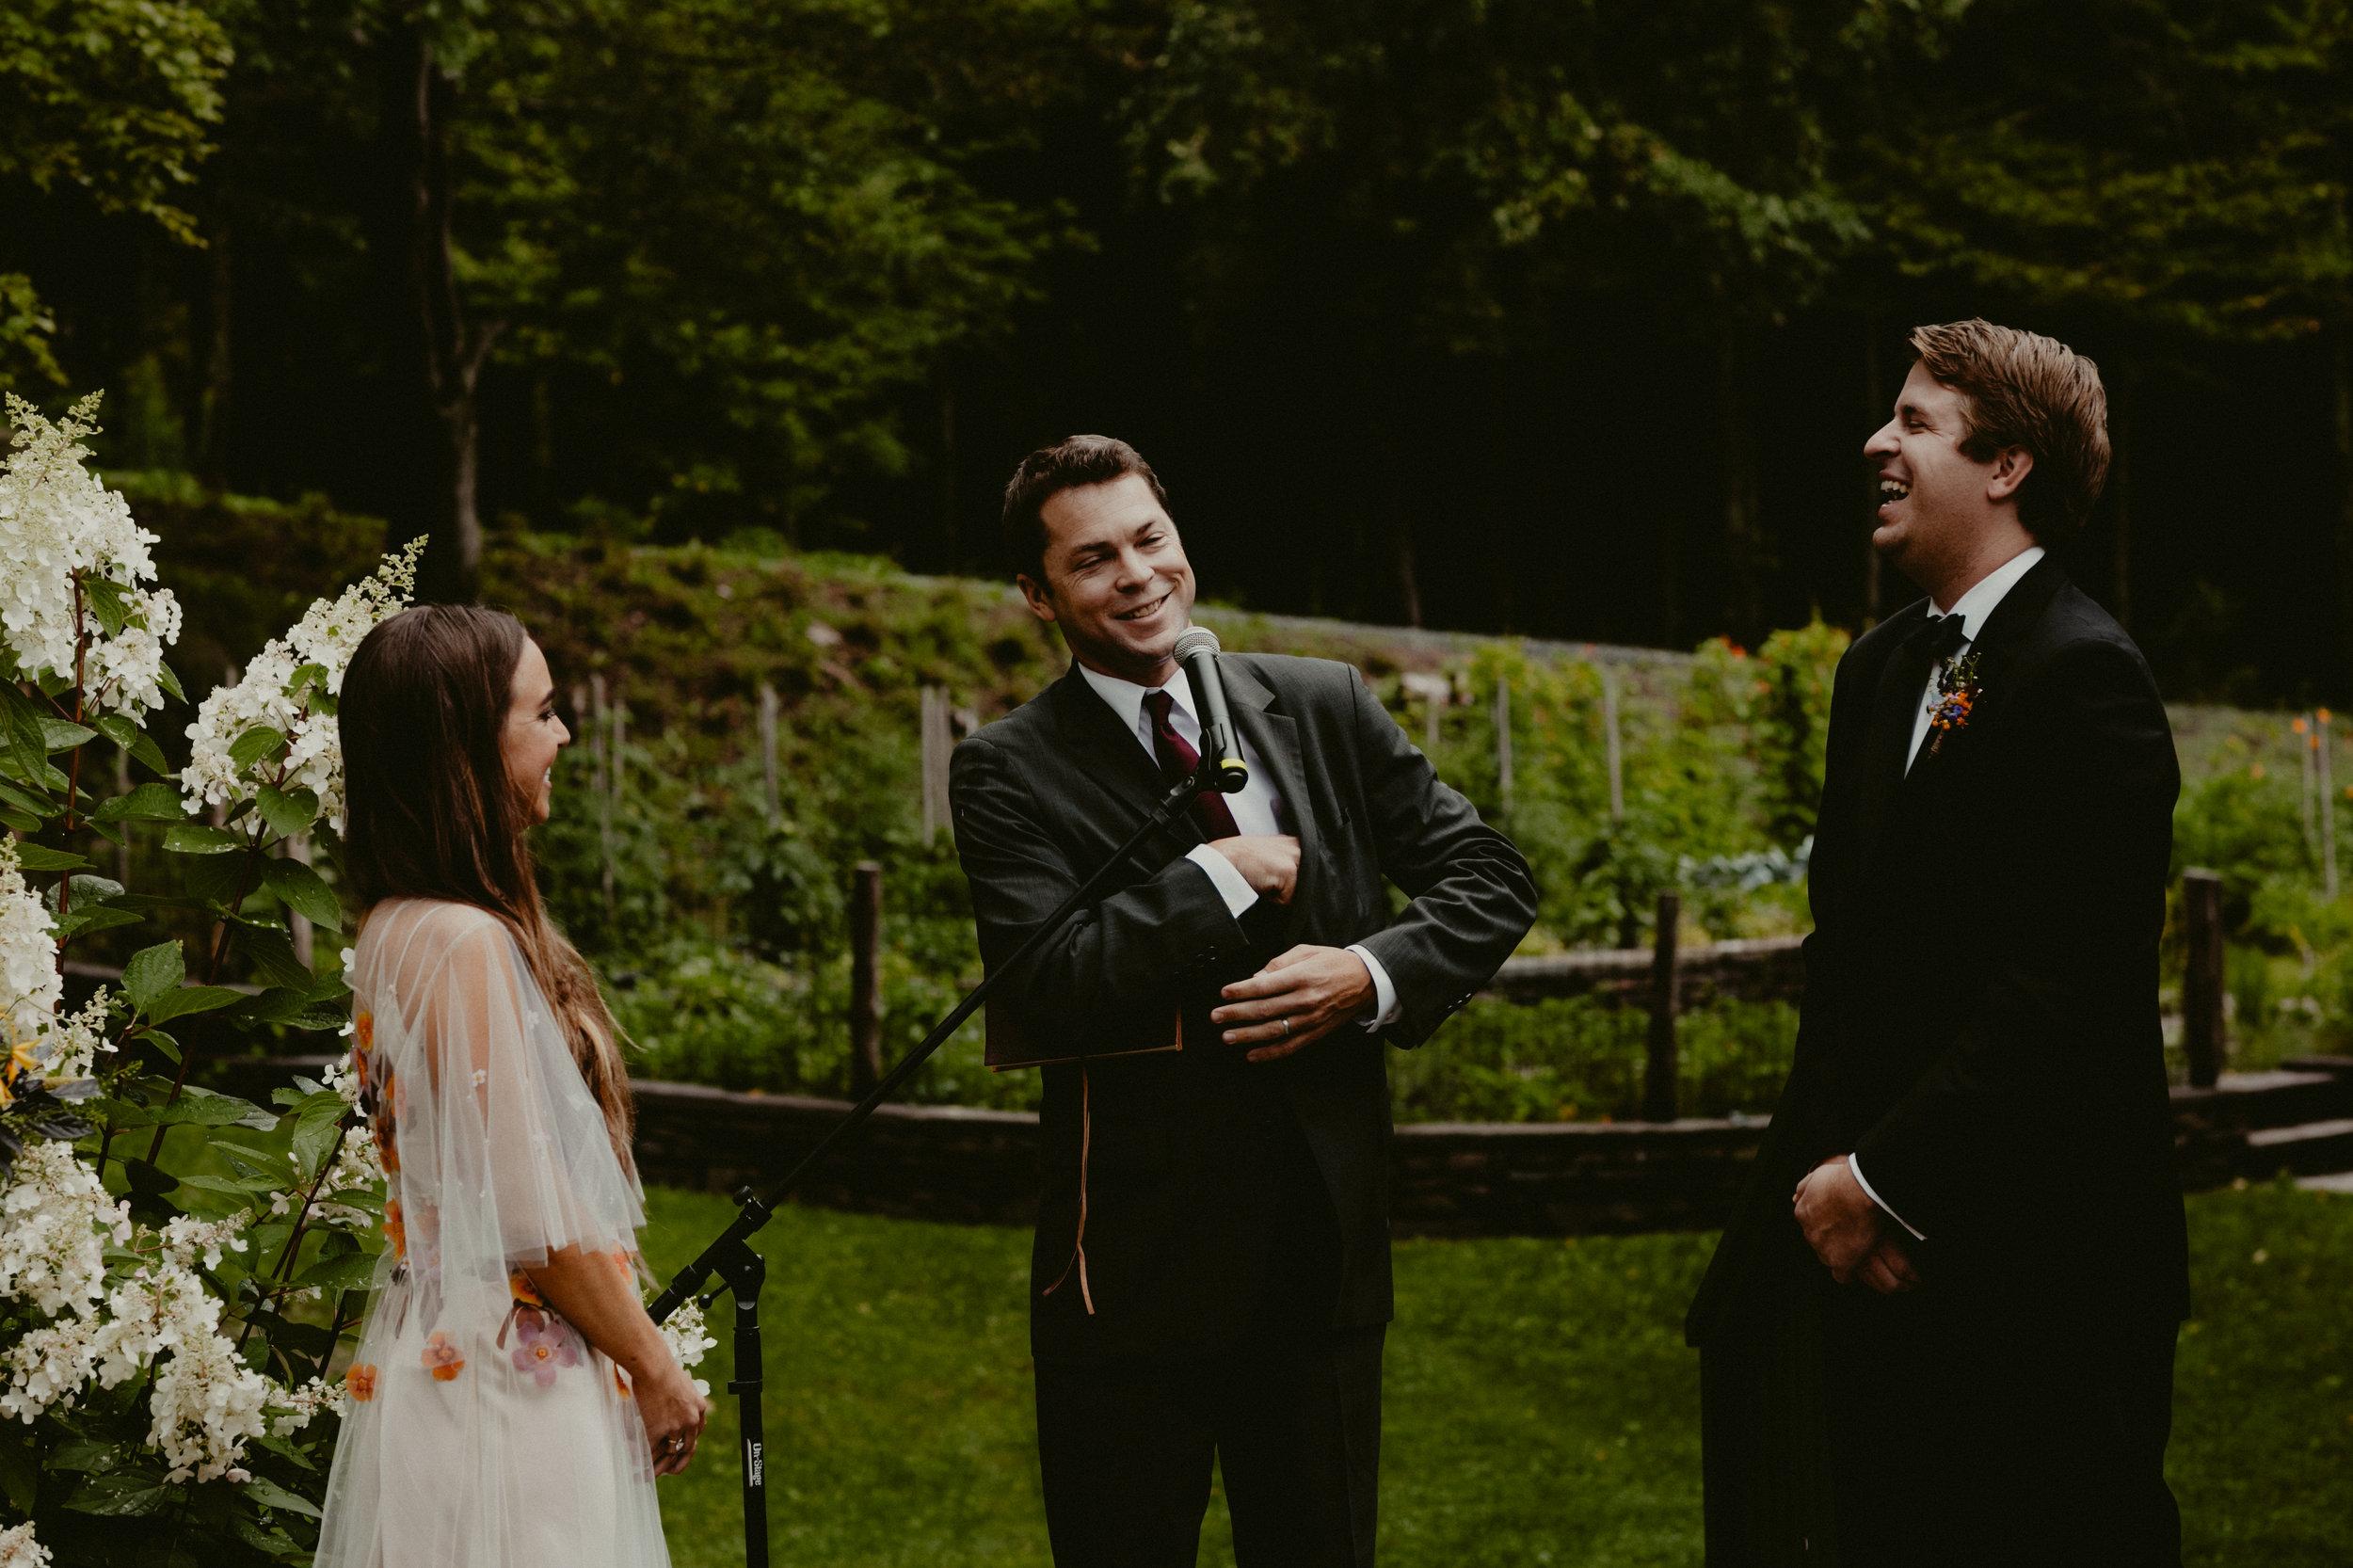 DEER_MOUNTAIN_INN_WEDDING_CHELLISE_MICHAEL_PHOTOGRAPHY-1399.jpg